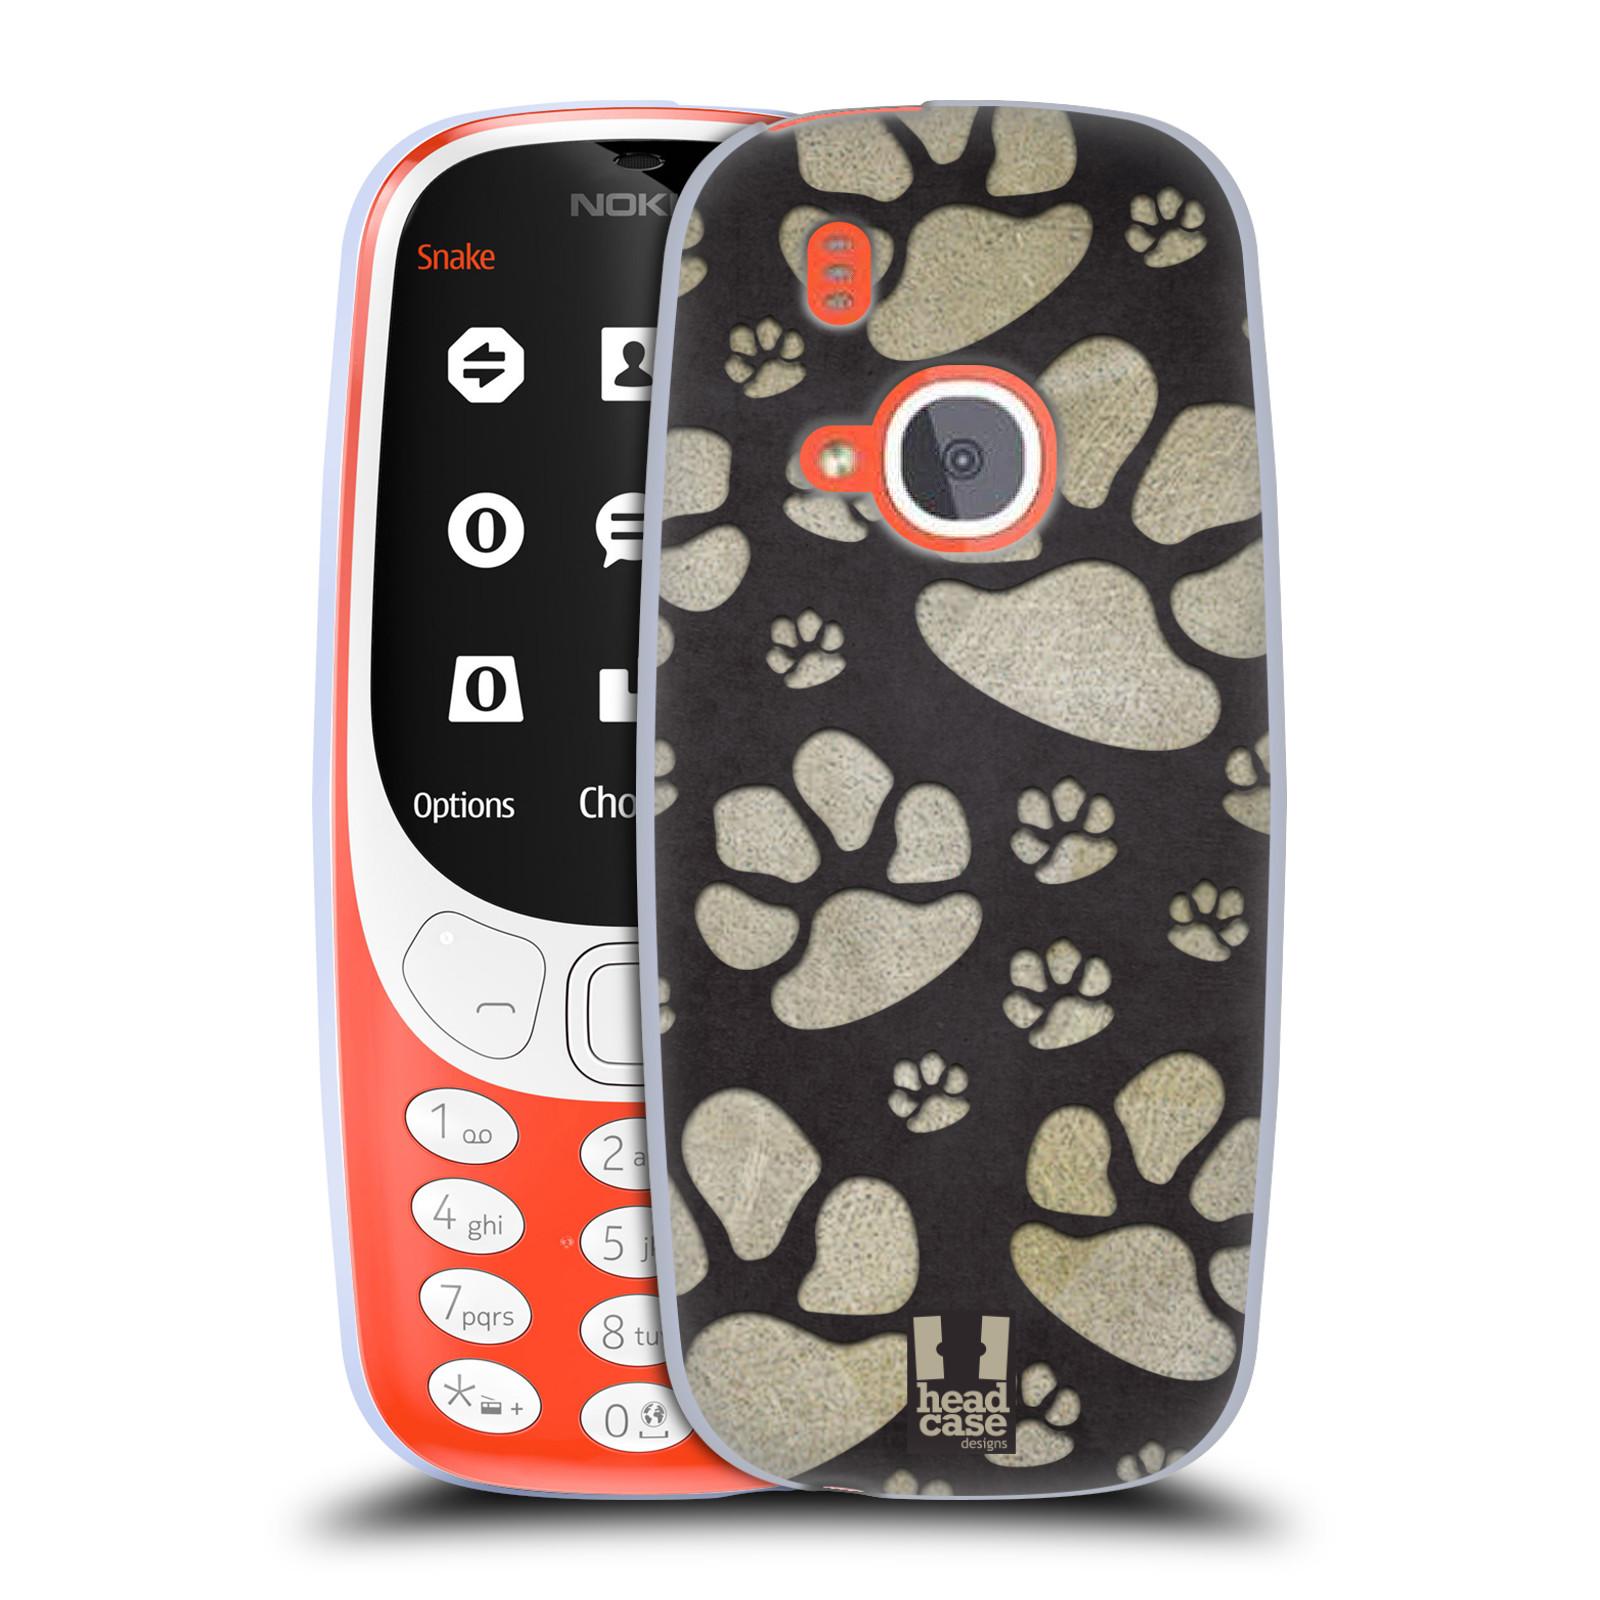 Silikonové pouzdro na mobil Nokia 3310 - Head Case - TLAPKY ŠEDÉ (Silikonový kryt či obal na mobilní telefon Nokia 3310 (2017) s motivem TLAPKY ŠEDÉ)